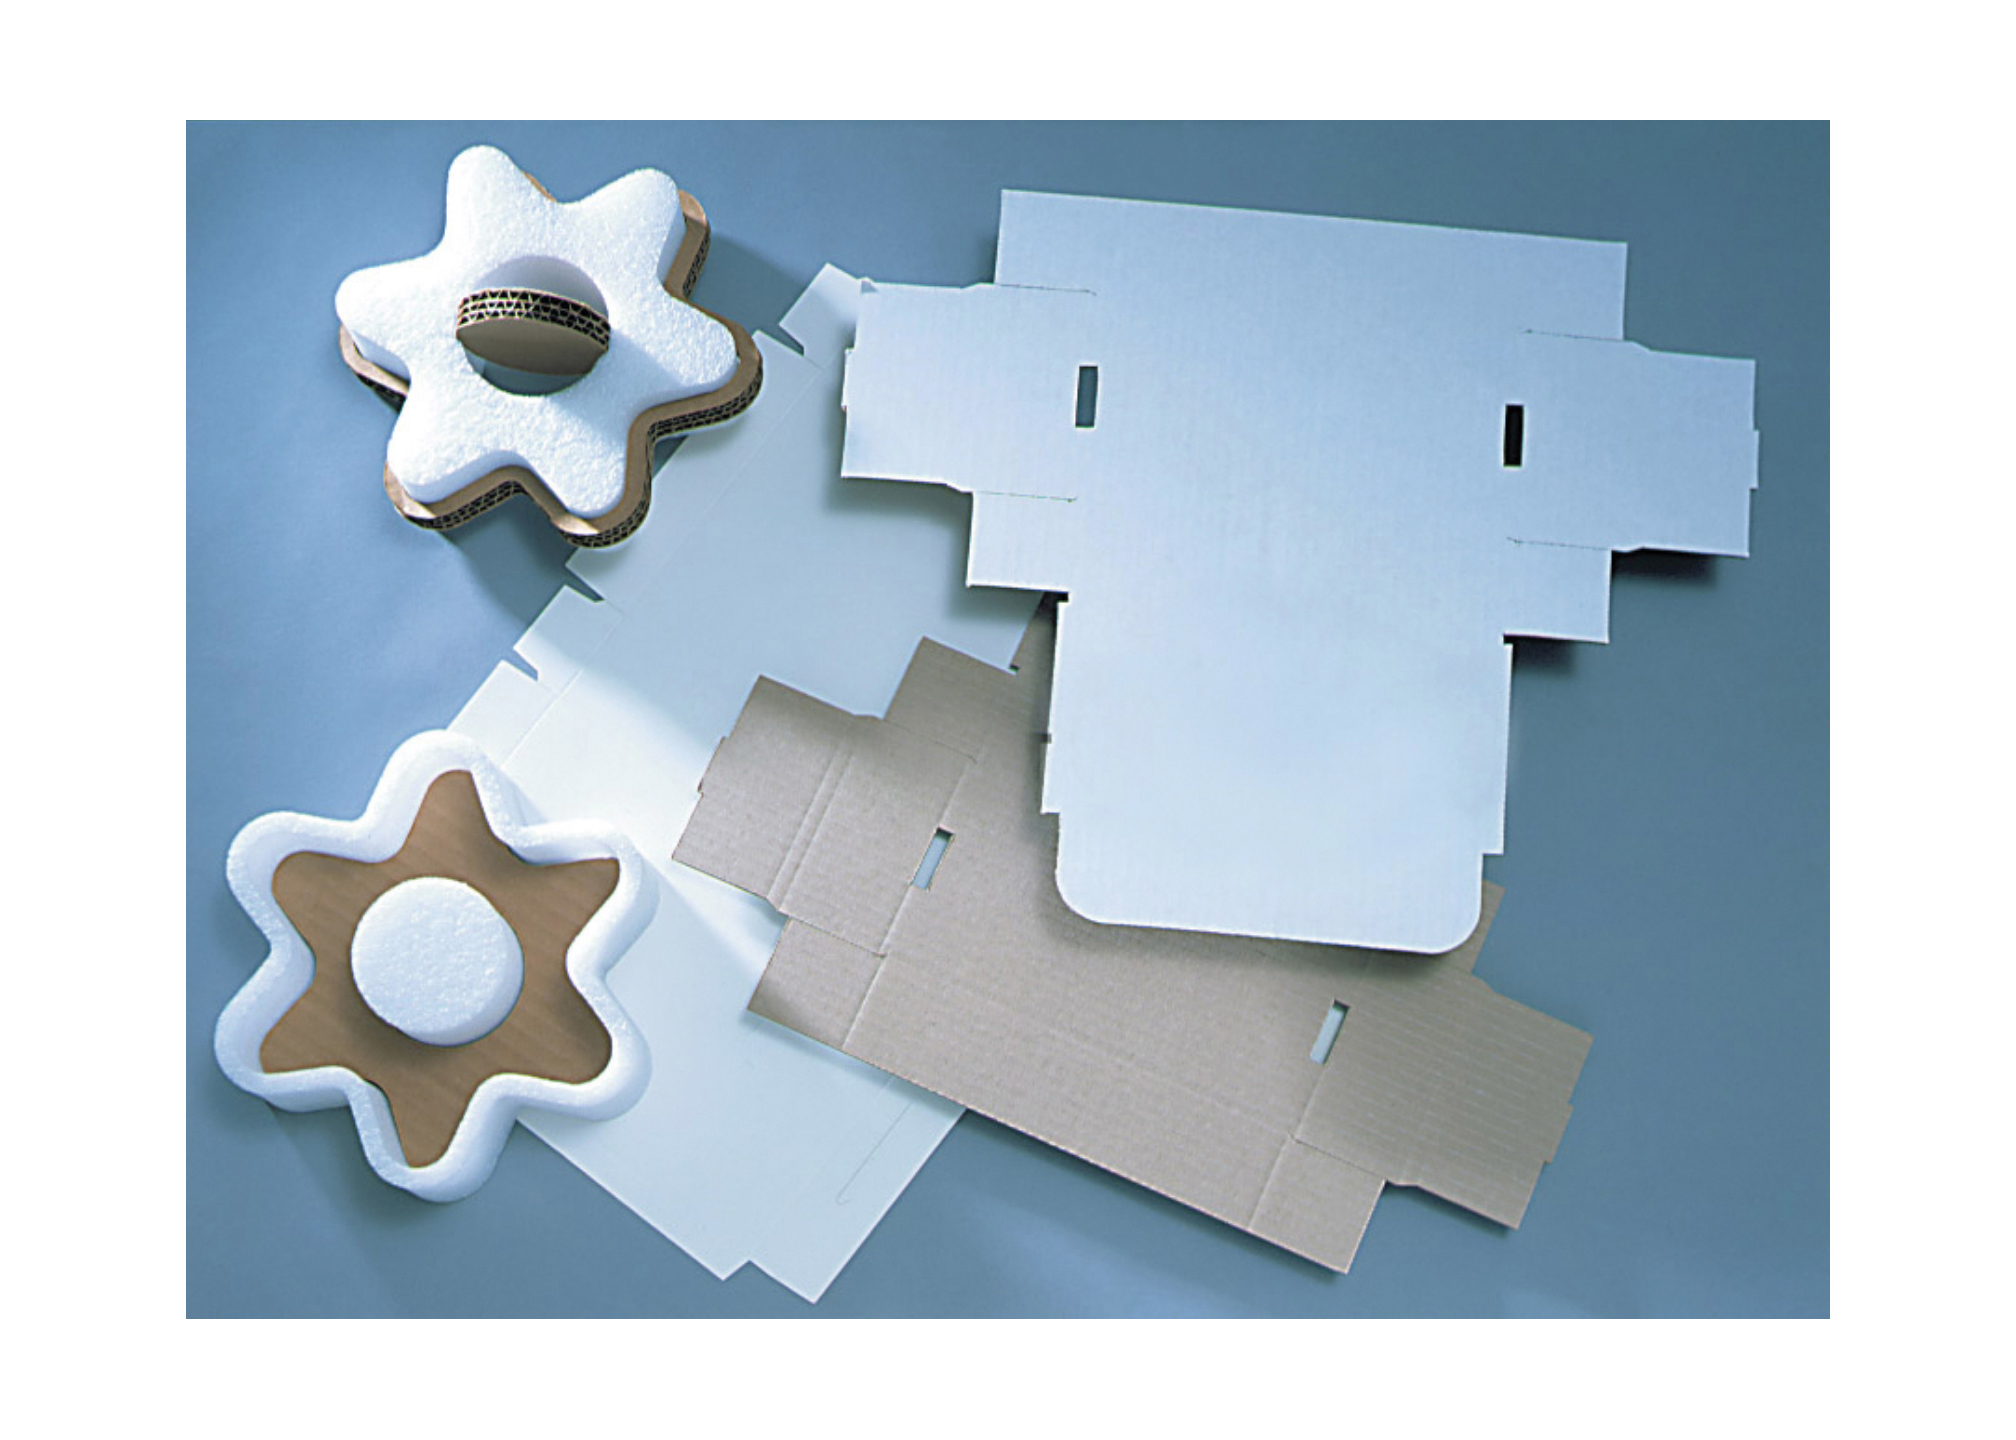 Foam and Cardboard Cutting